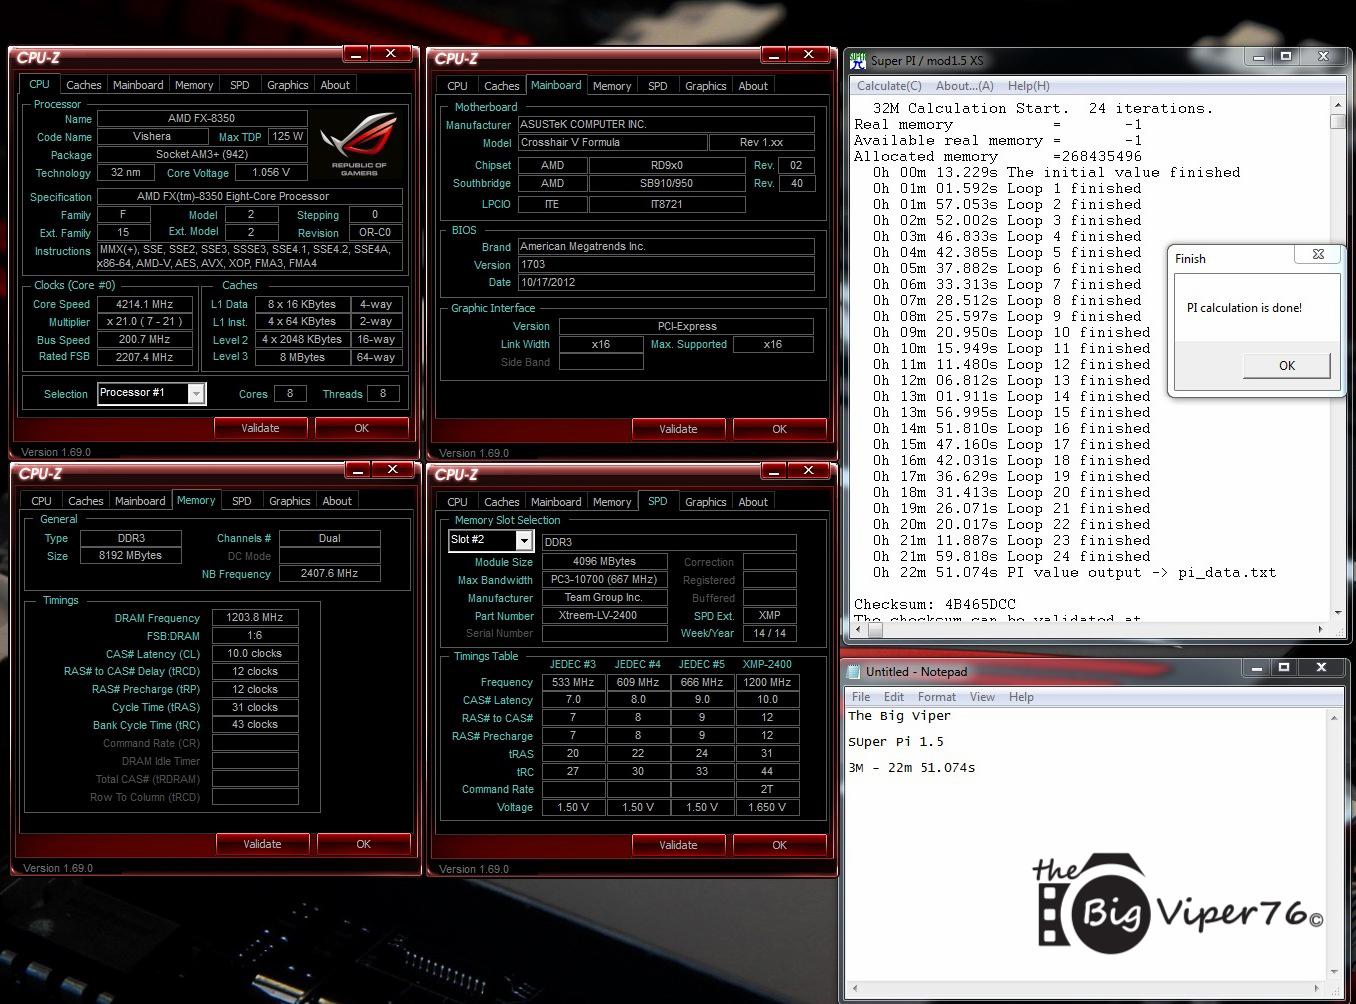 super-pi-1.5-32M-Stock-RUn